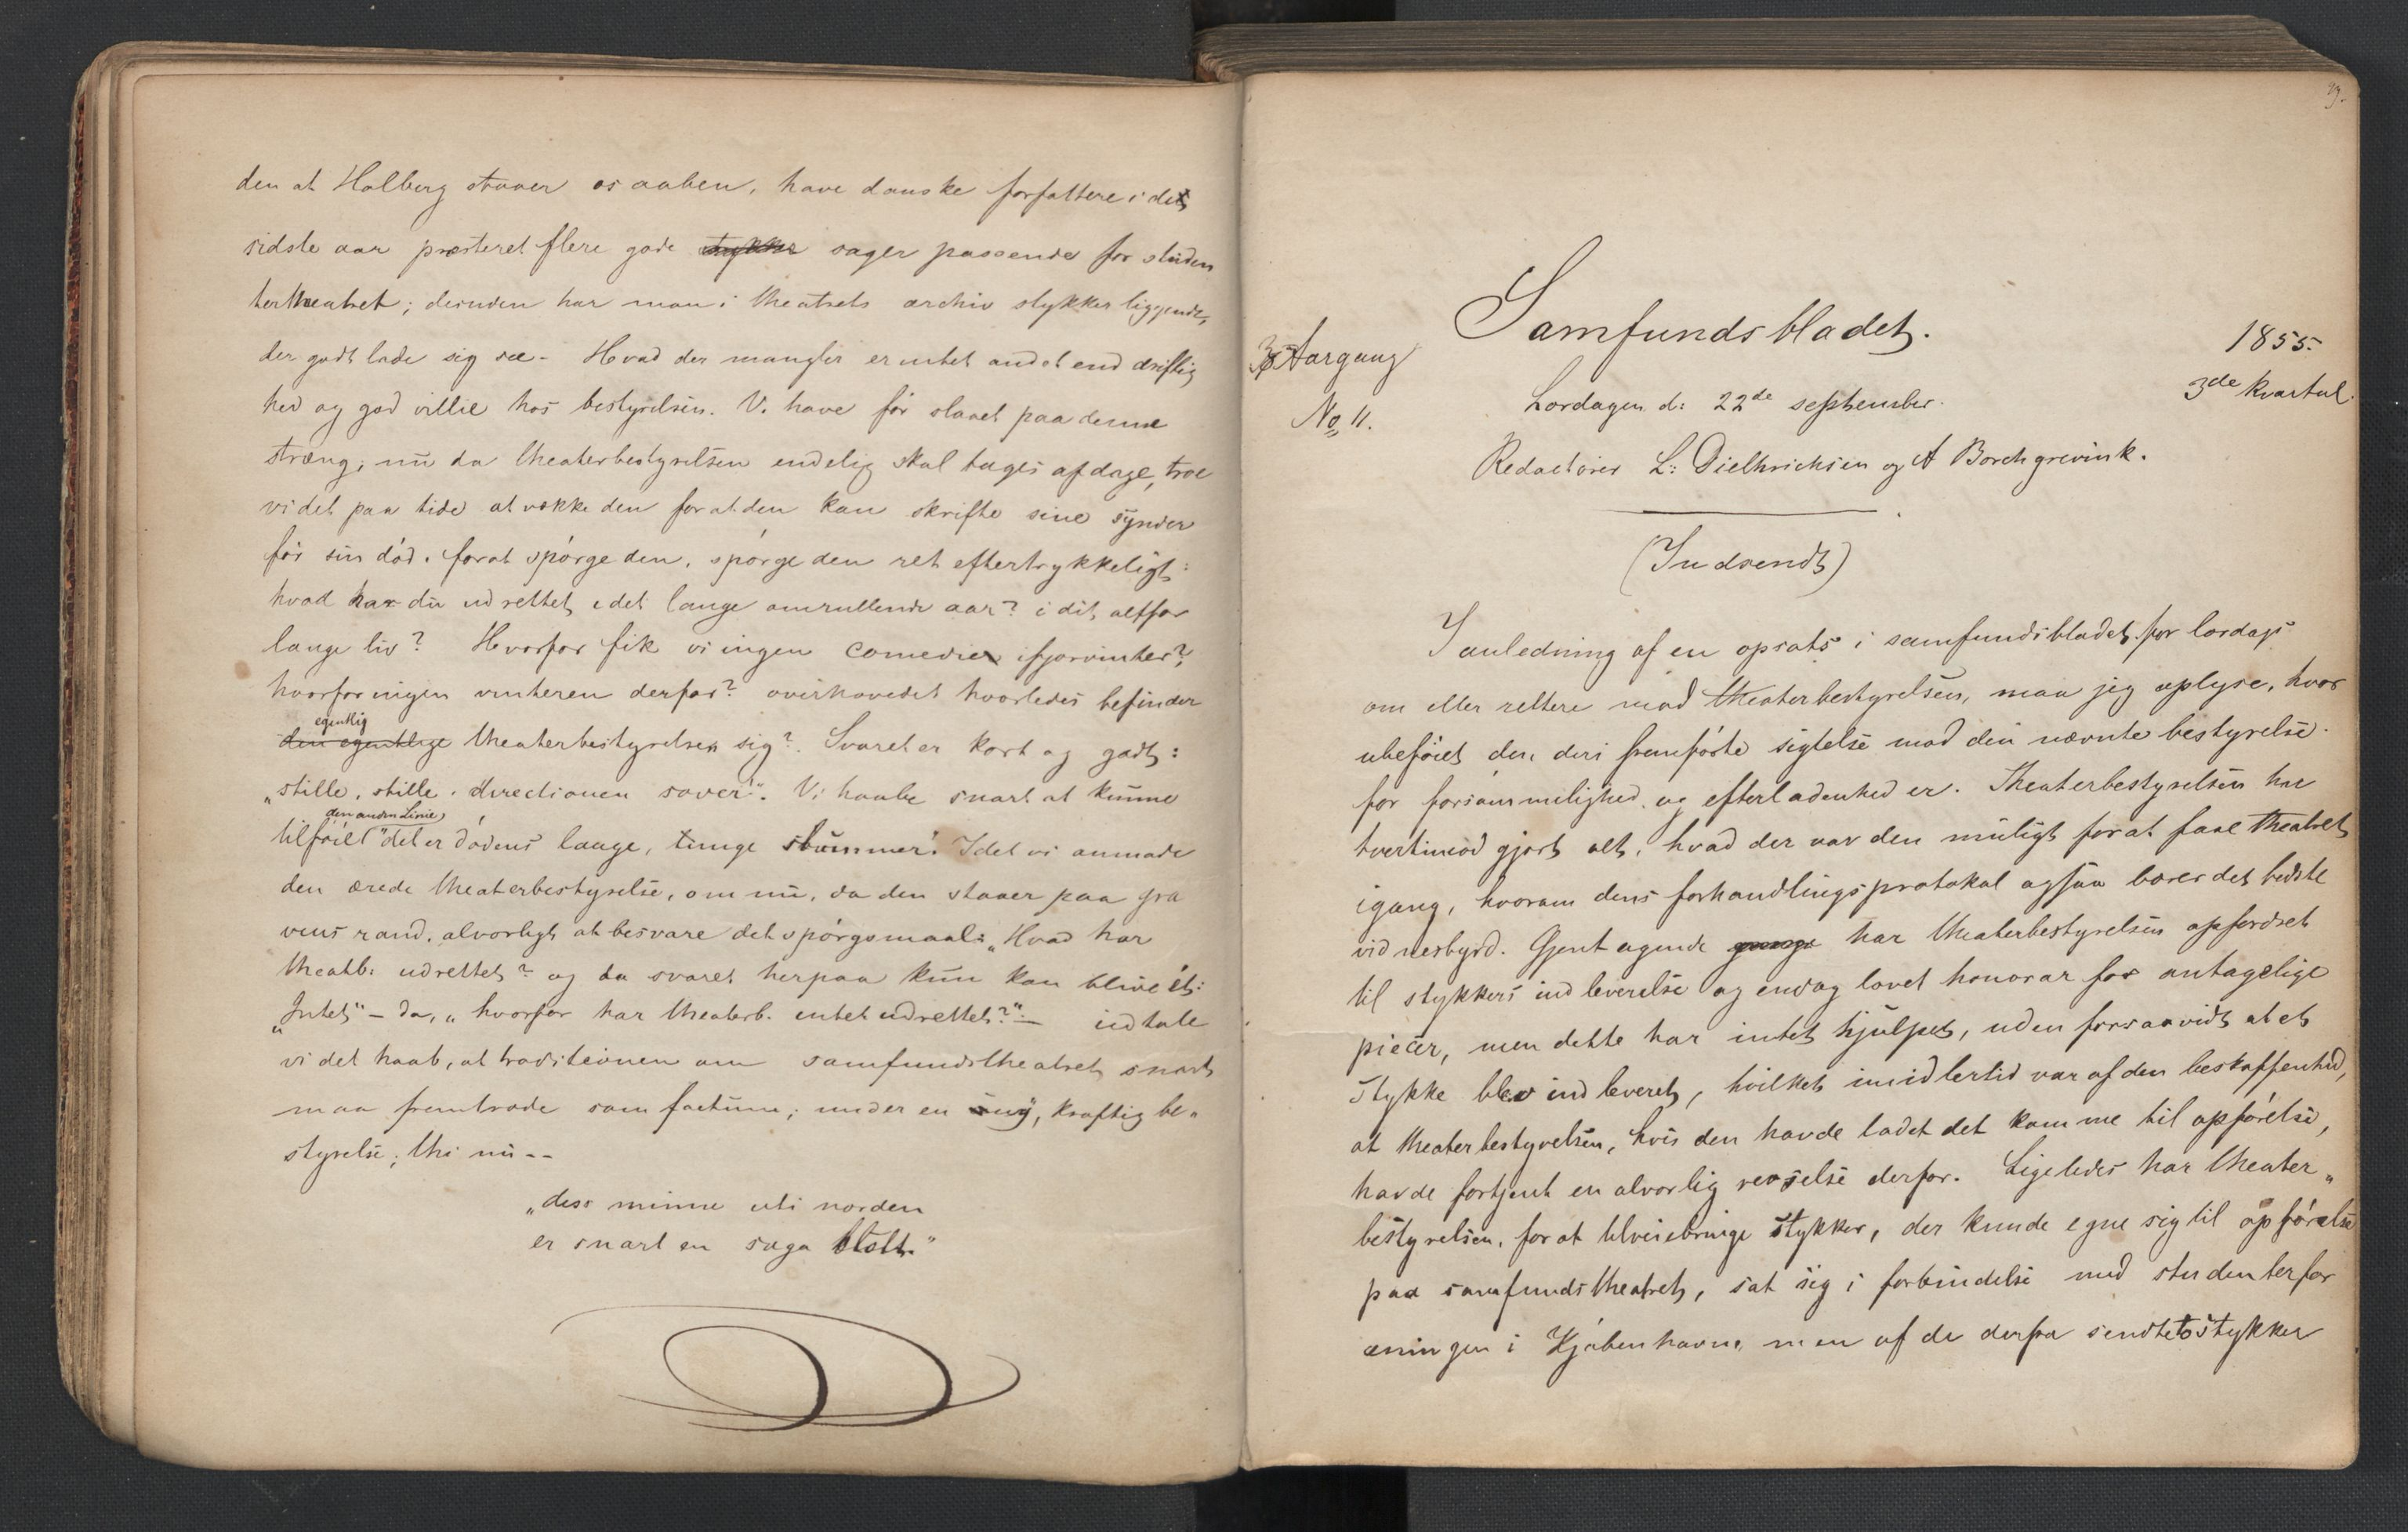 RA, Det Norske Studentersamfund, X/Xa/L0005, 1855-1856, s. 26